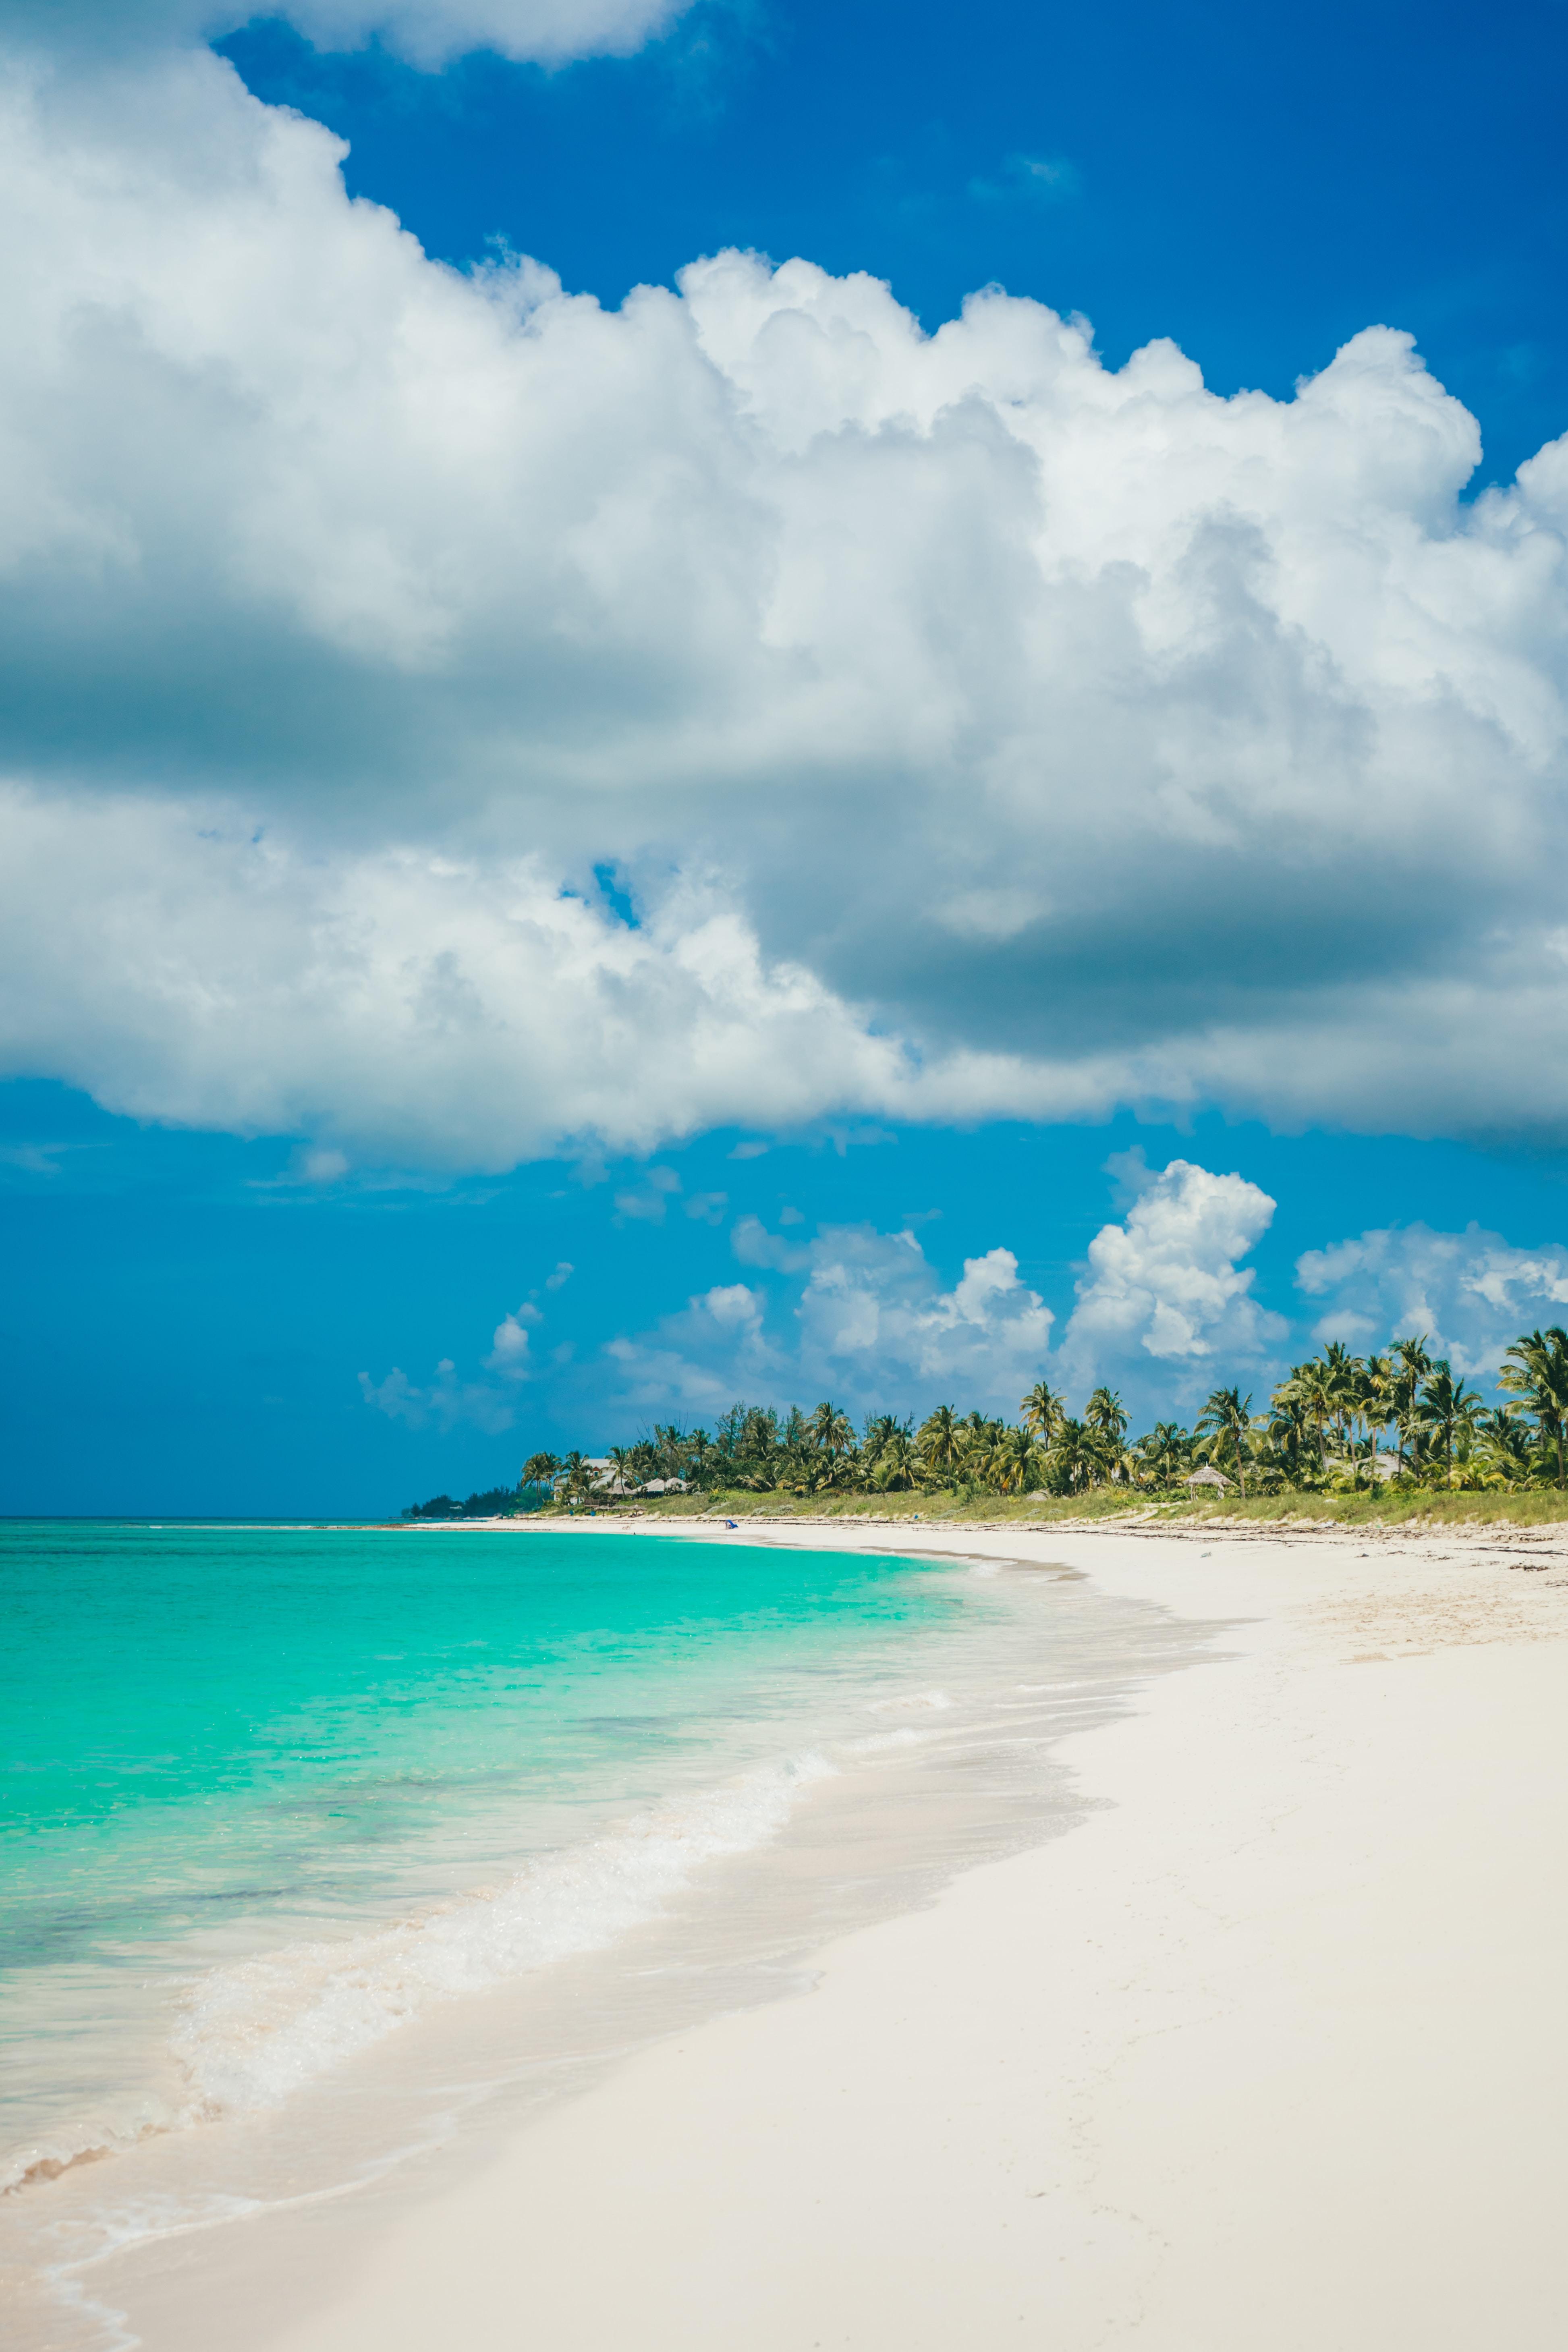 bahamas reisnaaramerika.com